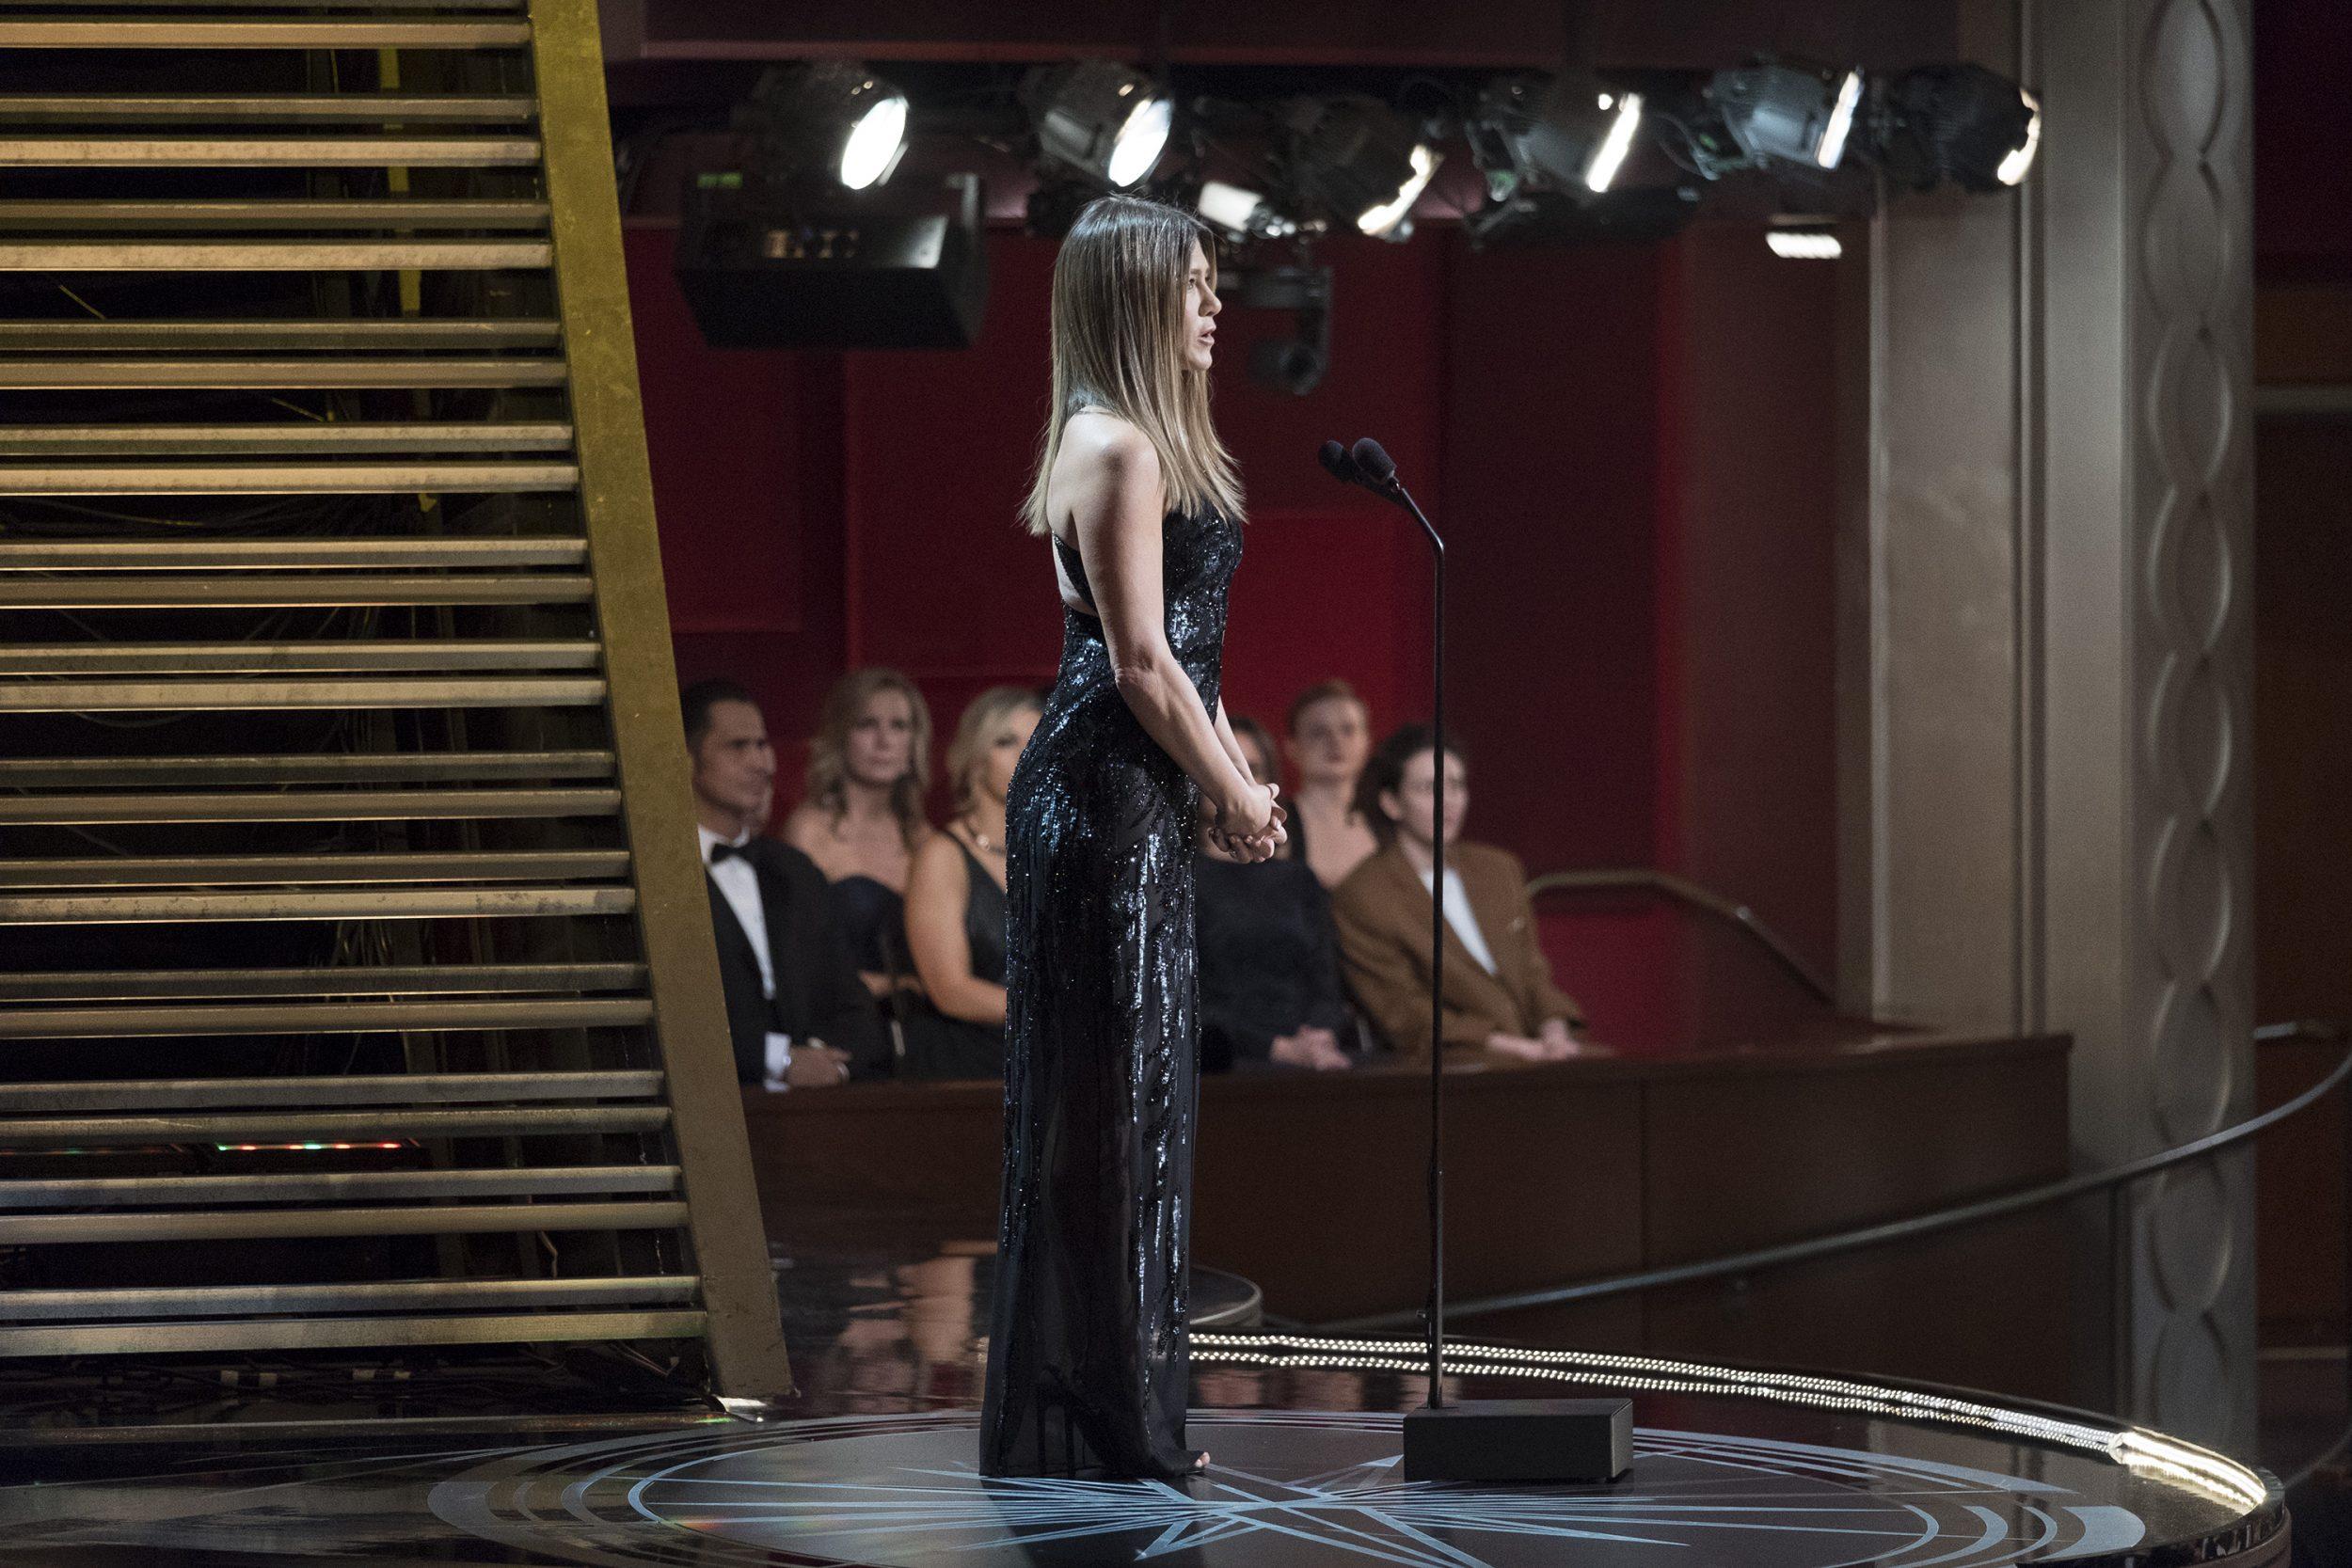 THE OSCARS(r) - The 89th Oscars(r)  broadcasts live on Oscar(r) SUNDAY, FEBRUARY 26, 2017, on the ABC Television Network. (ABC/Adam Rose) JENNIFER ANISTON